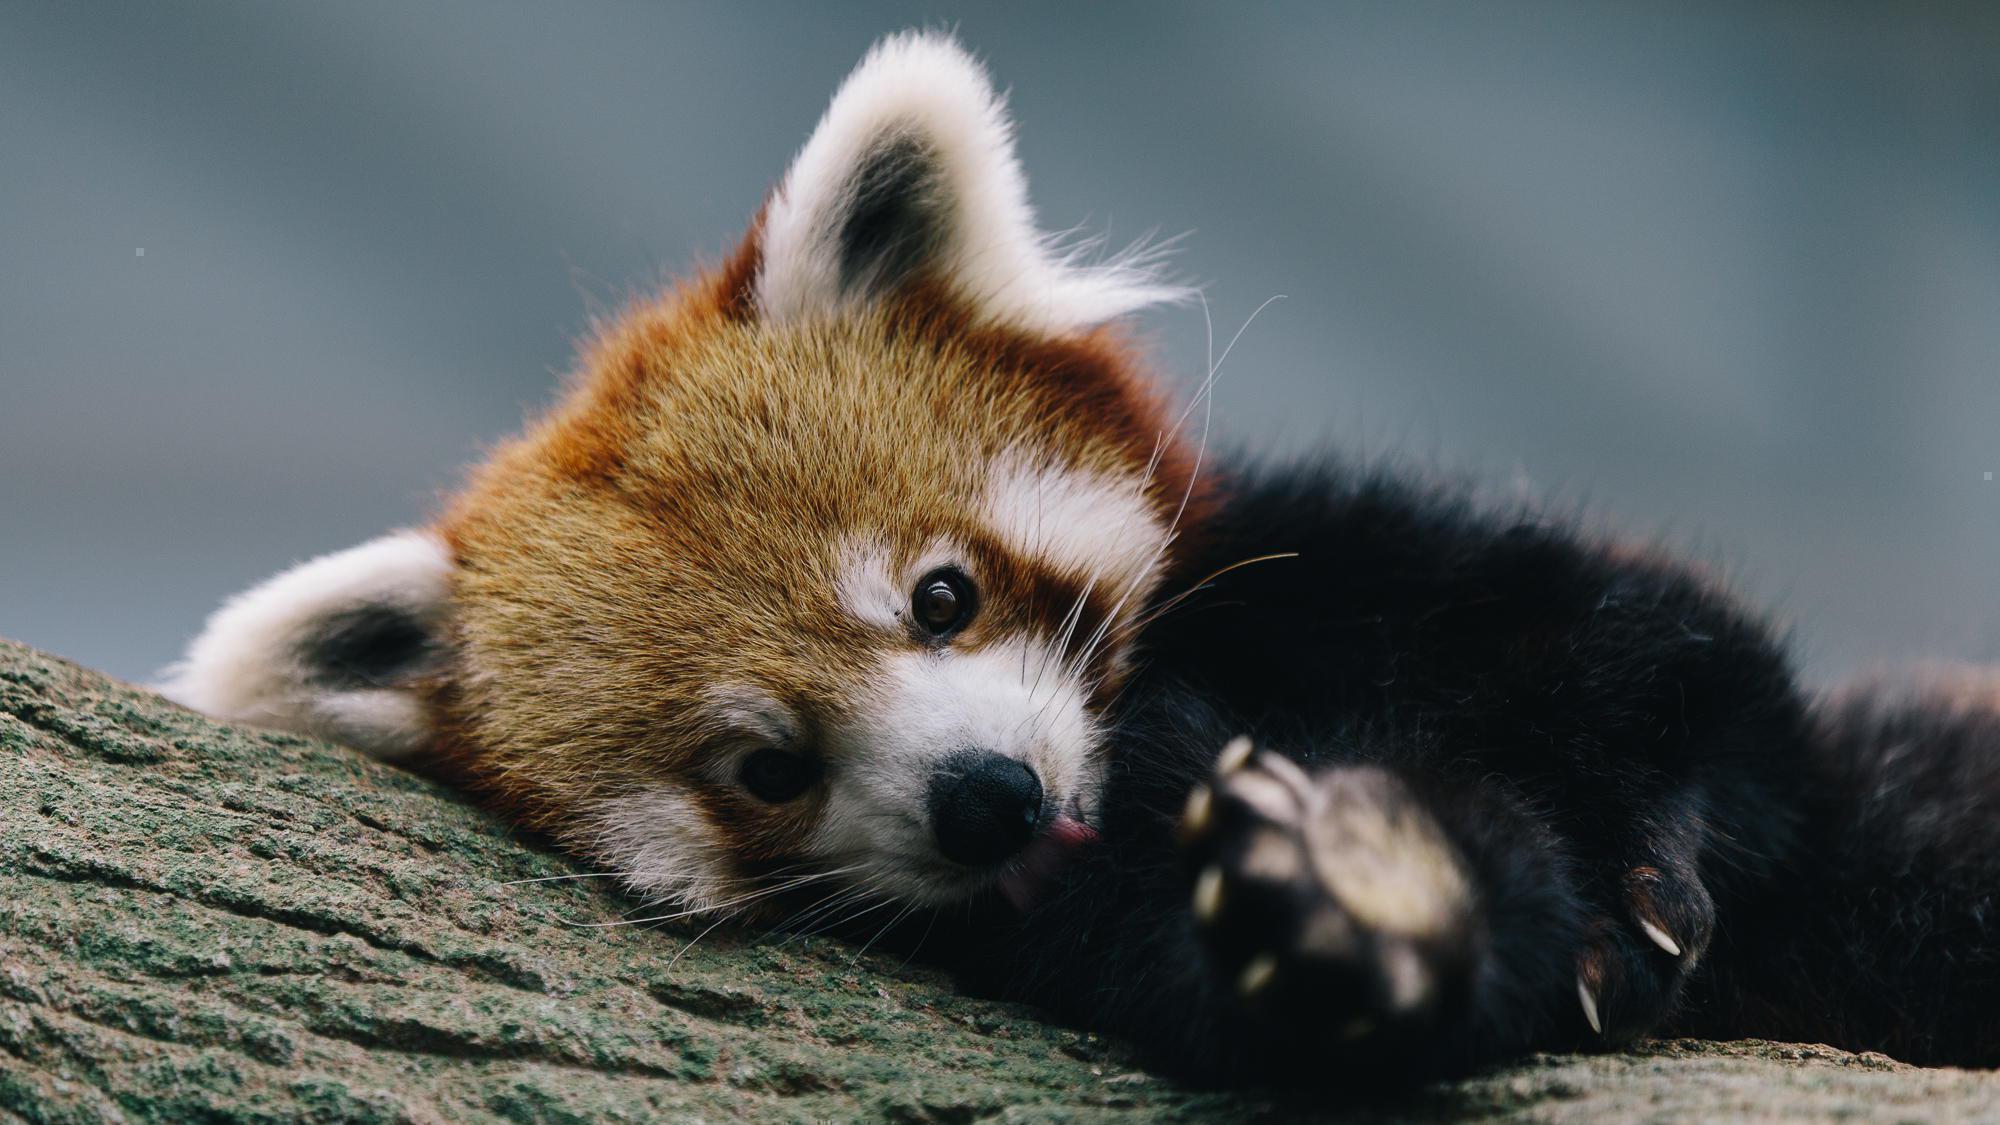 Sad Baby Red Panda Wallpaper Red Panda 121479 Hd Wallpaper